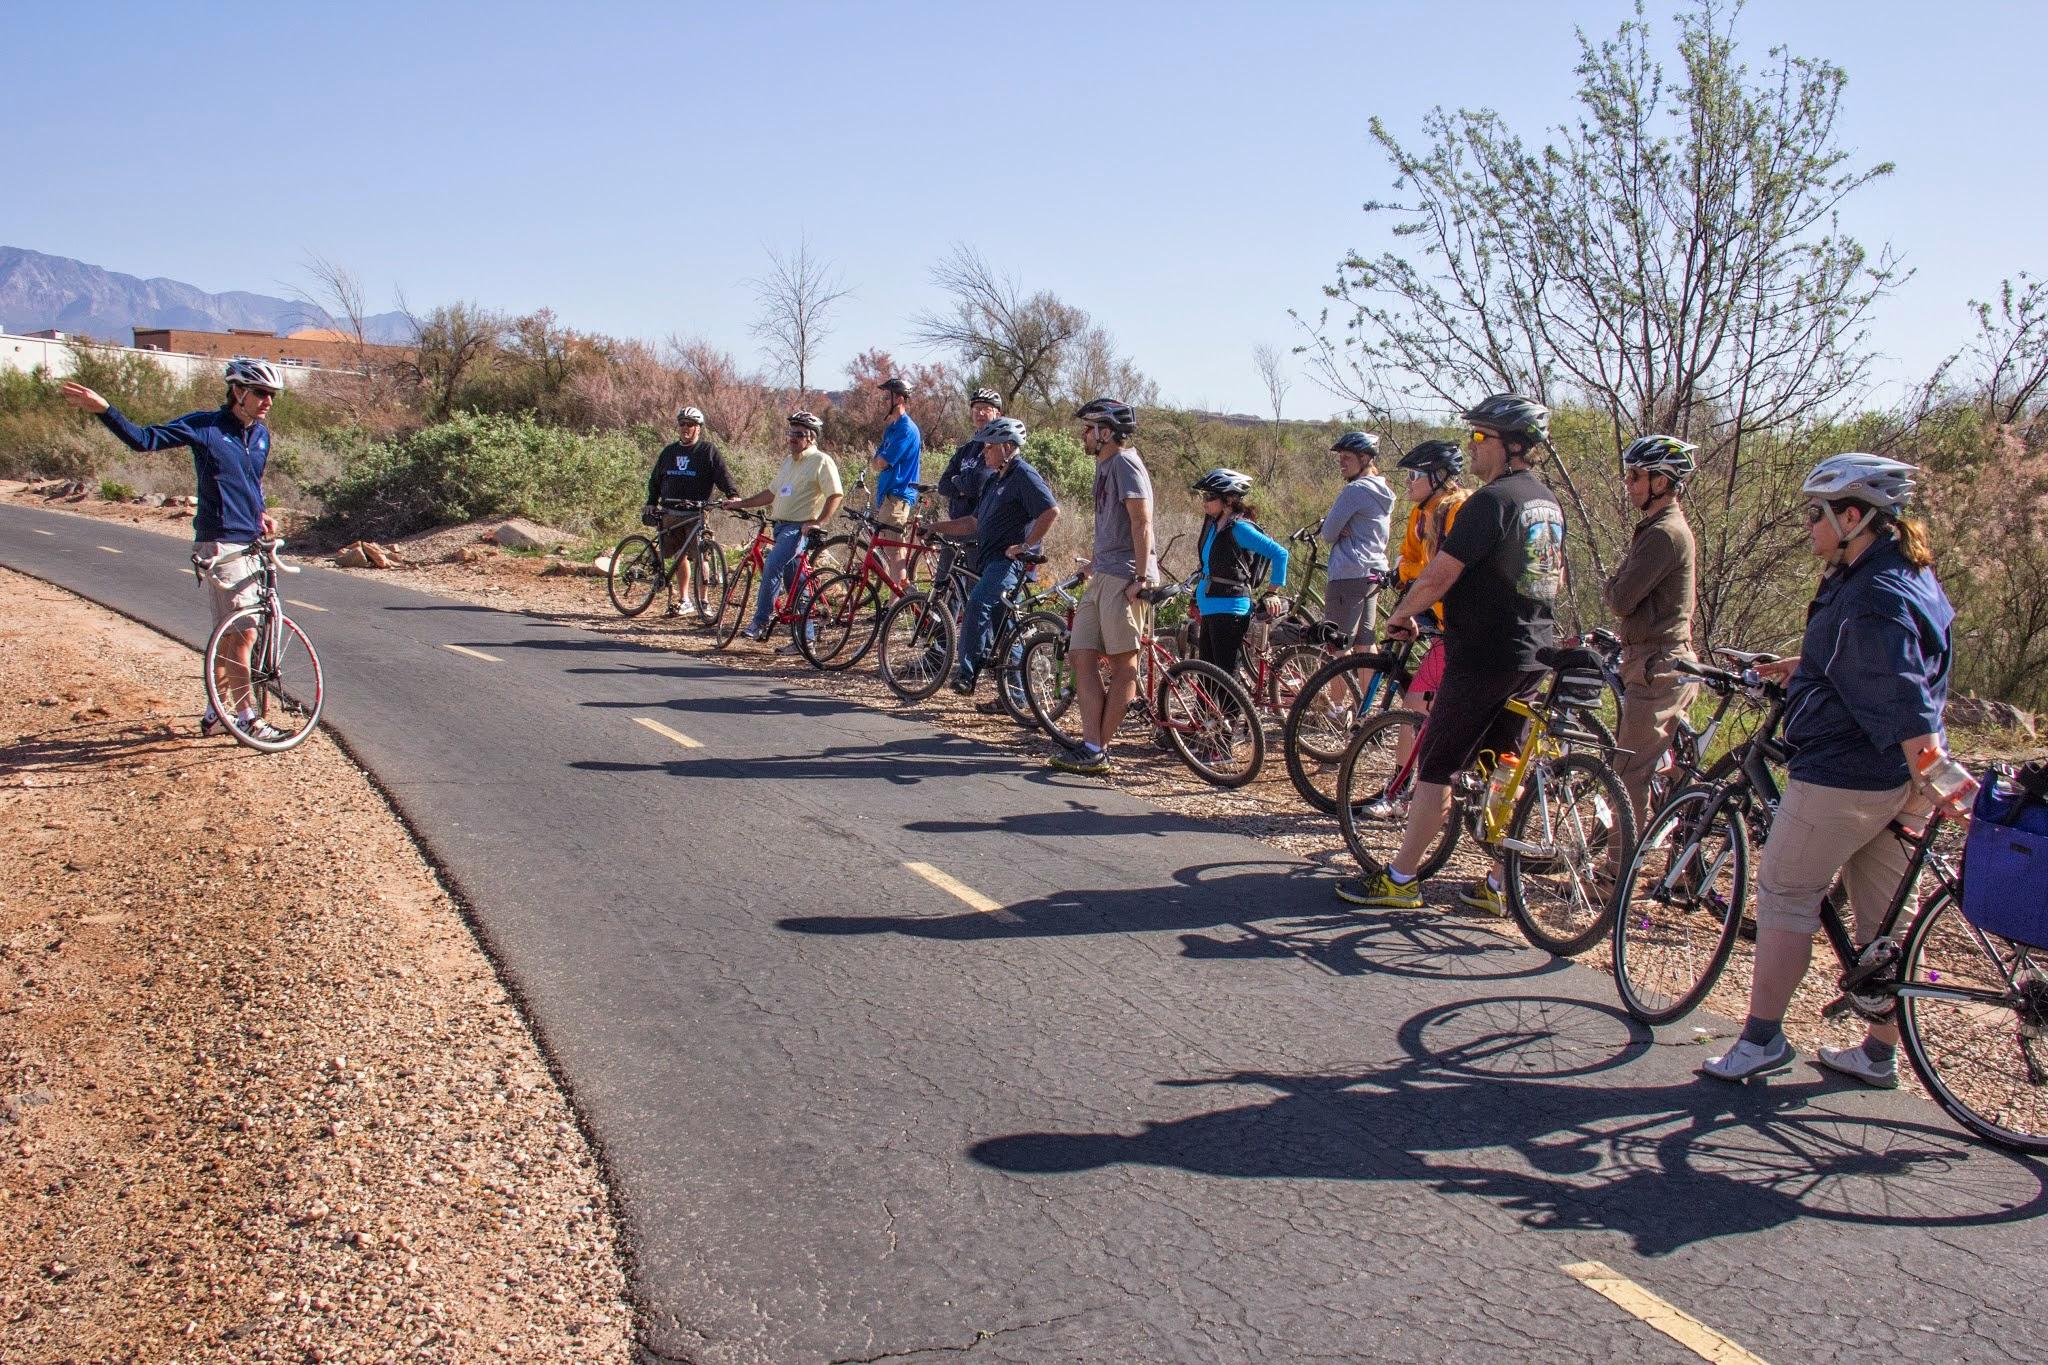 St. George MATT (Mobiel Active Transportation Tour) on April 3, 2015. Photo by Richard Brockmyer